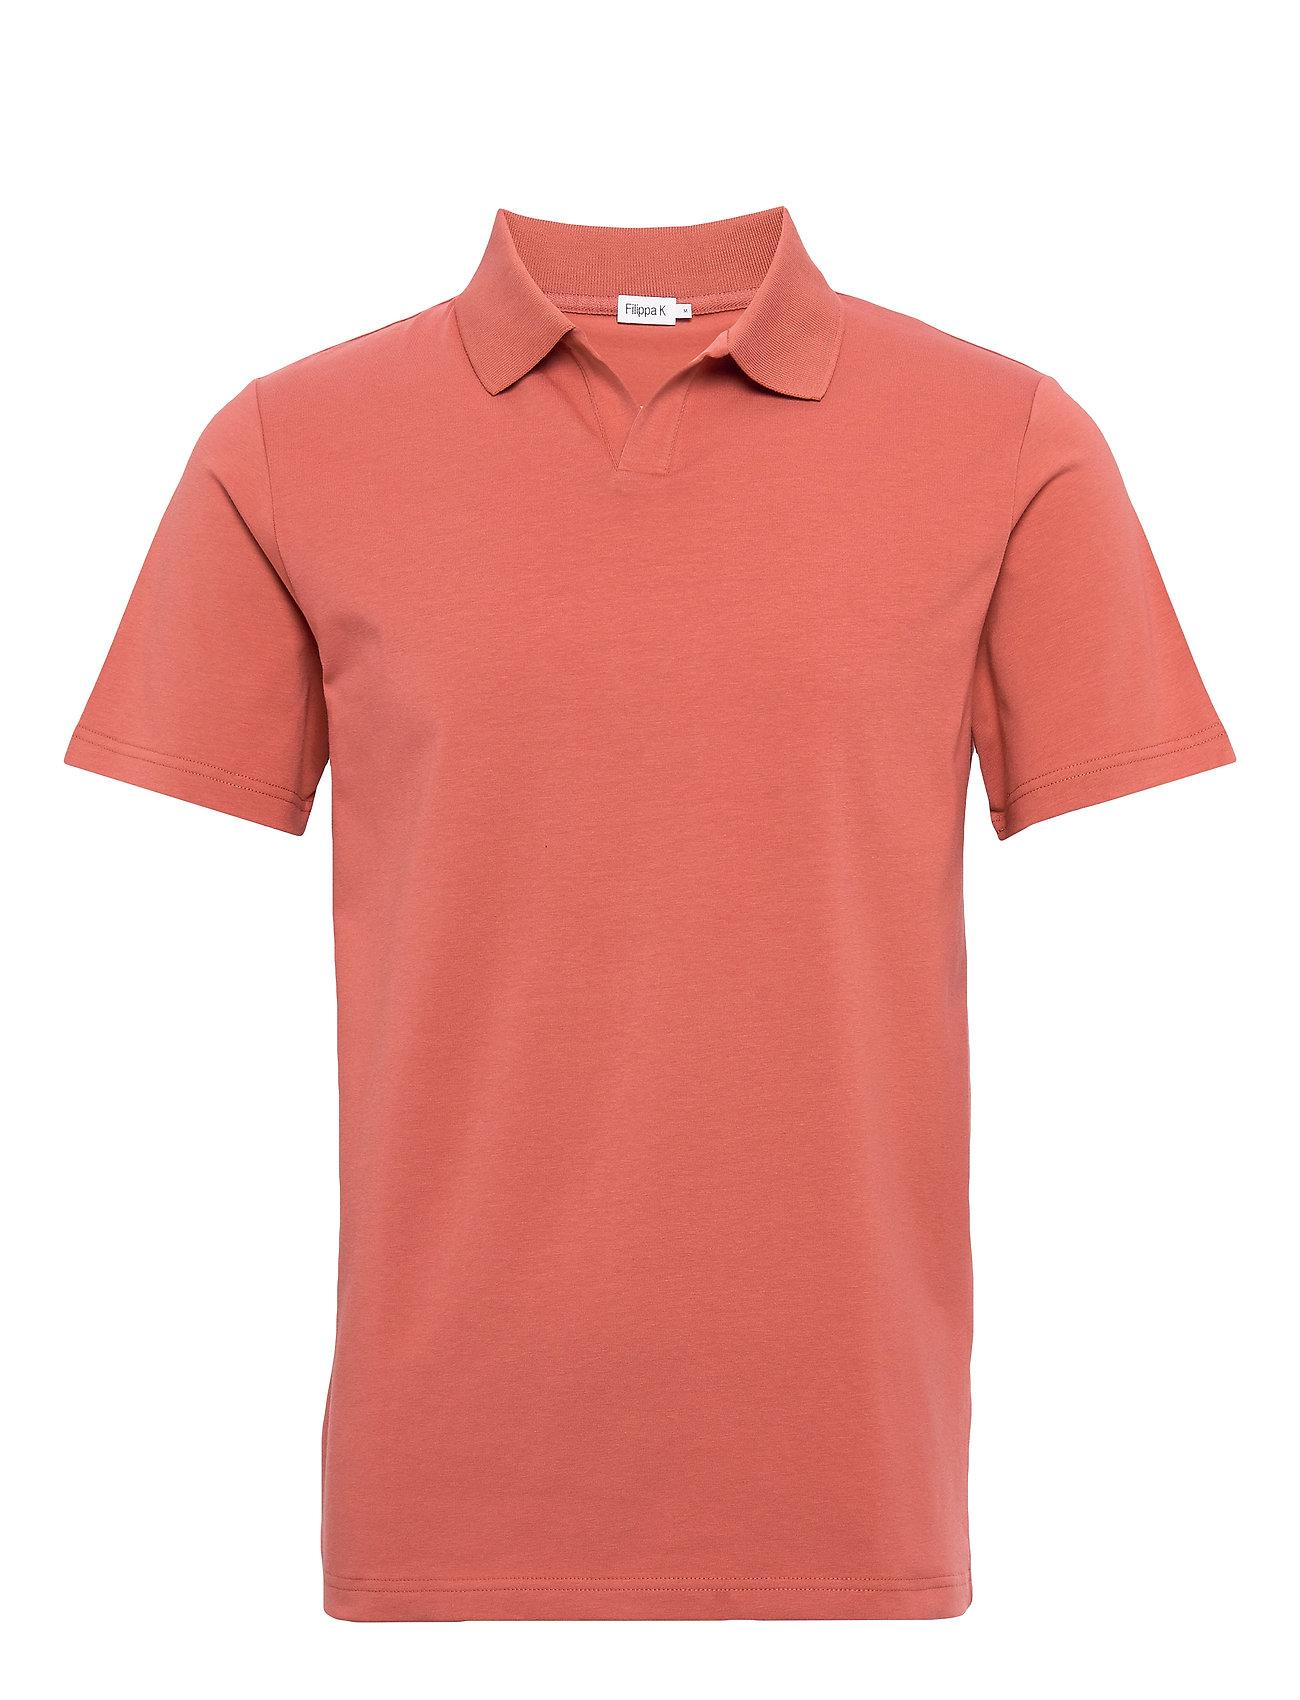 Filippa K M. Lycra Polo T-Shirt - PINK CEDAR